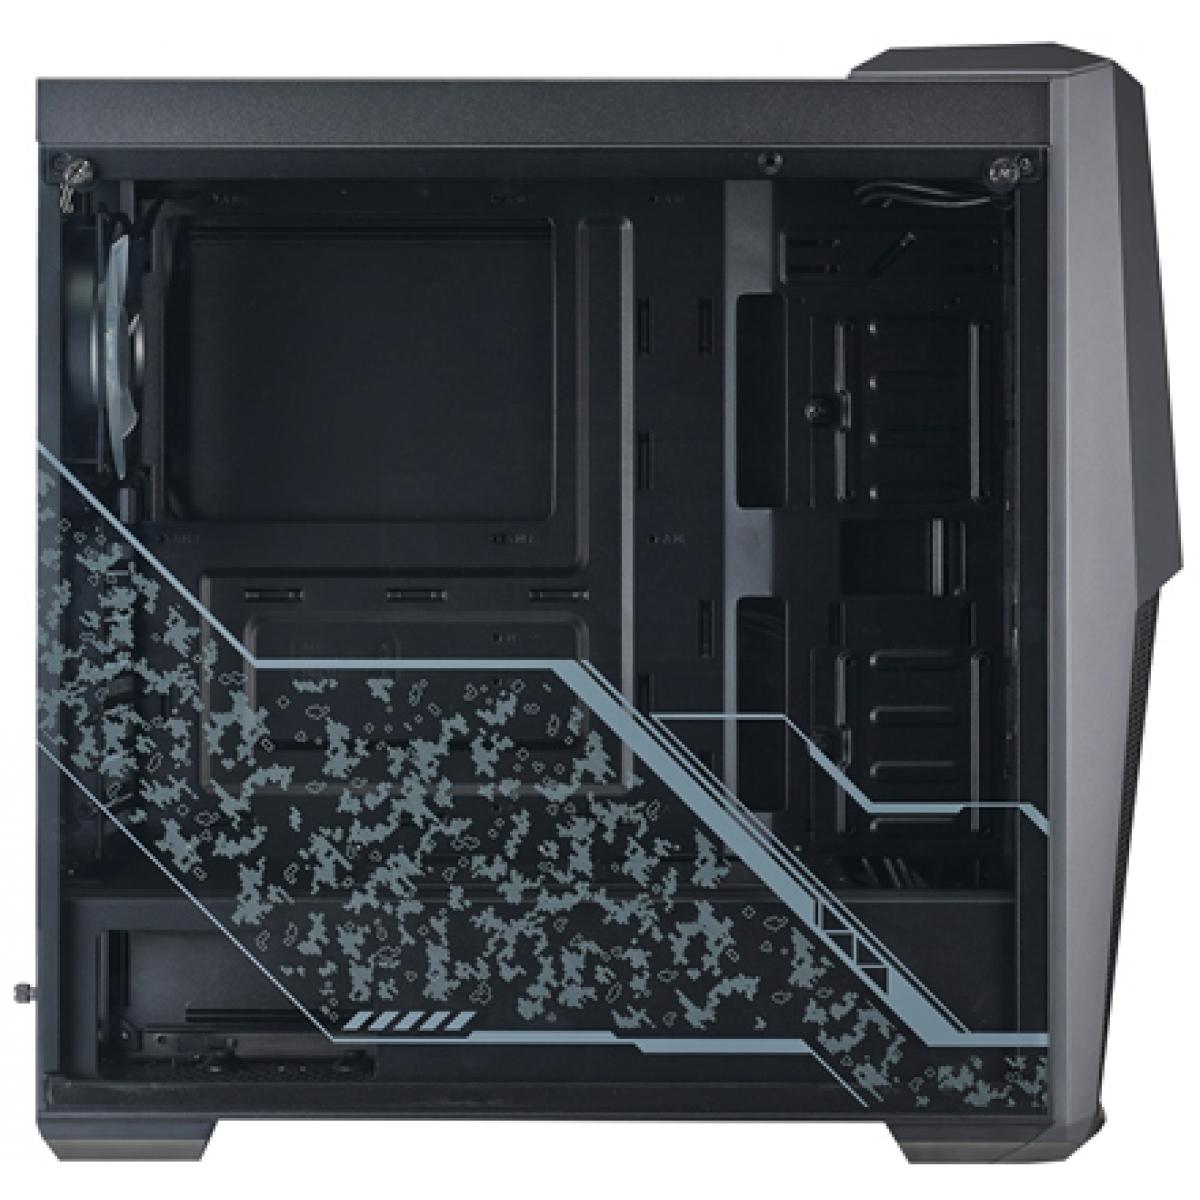 Gabinete Gamer Cooler Master Masterbox MB500 Tuf Gaming, Mid Tower, Com 3 Fans RGB, Vidro Temperado, Black, S-Fonte, MCB-B500D-KGNN-TUF